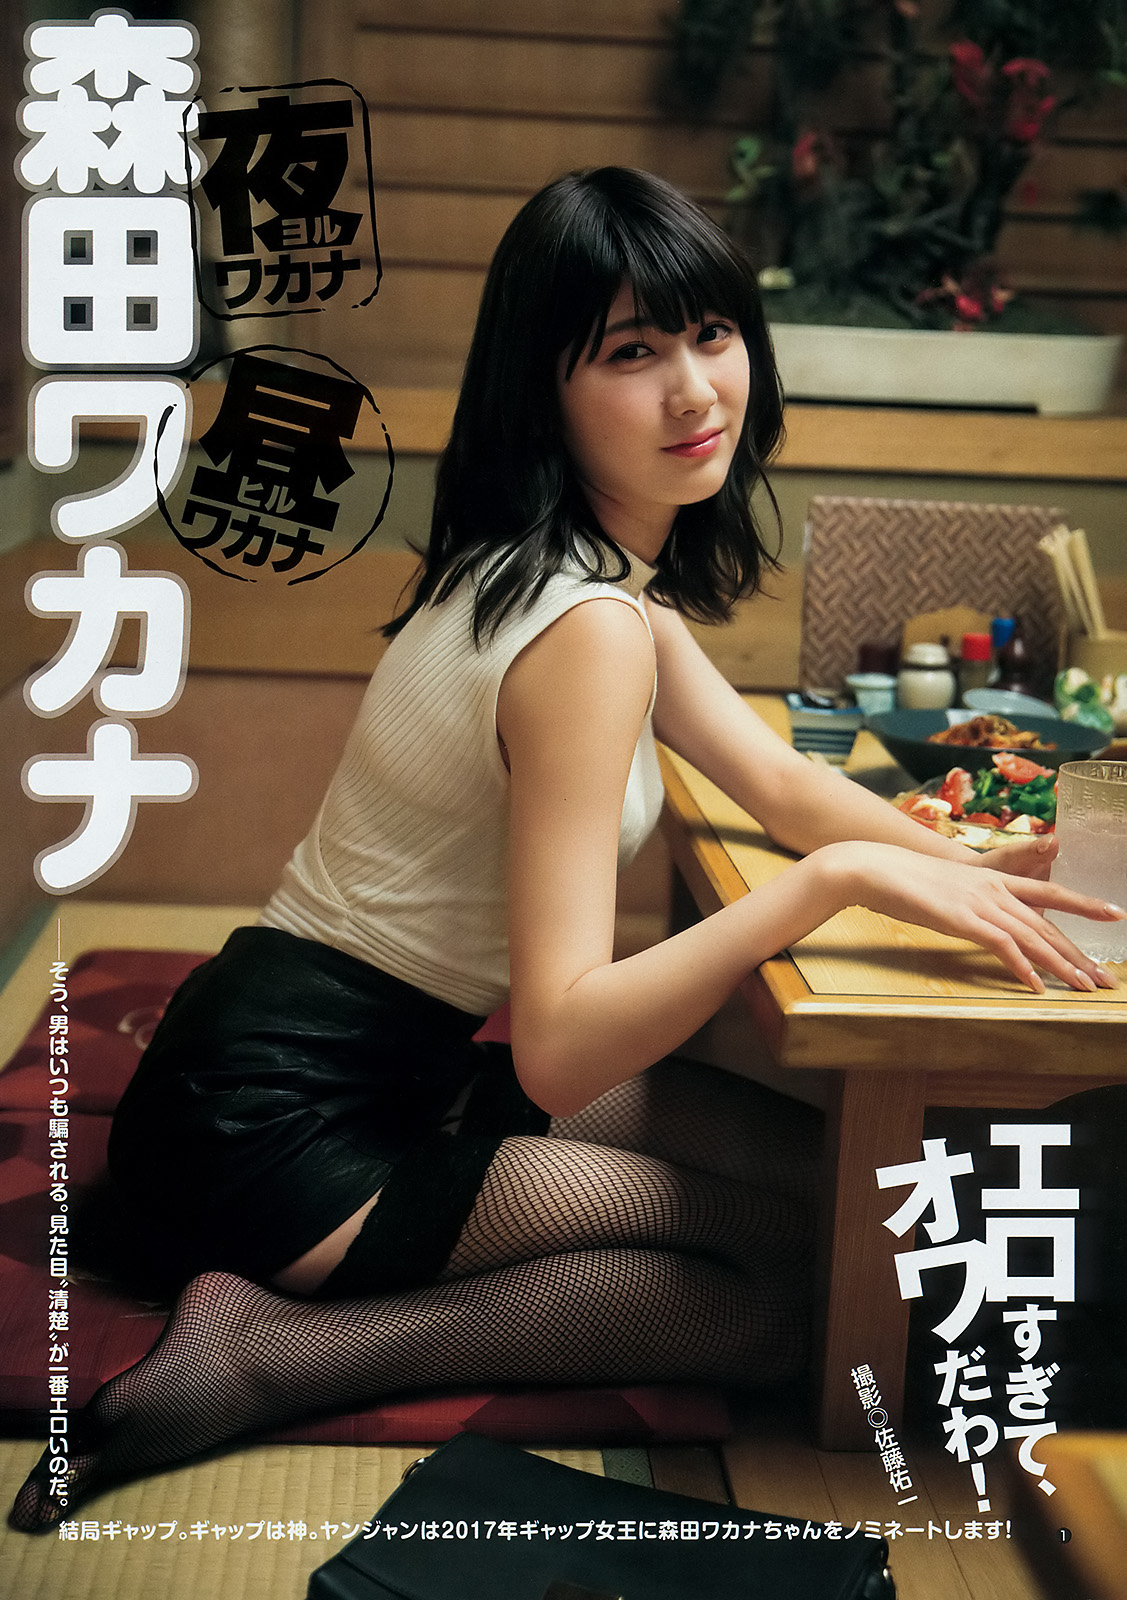 Morita Wakana 森田ワカナ, Young Jump 2017 No.52 (週刊ヤングジャンプ 2017年52号)